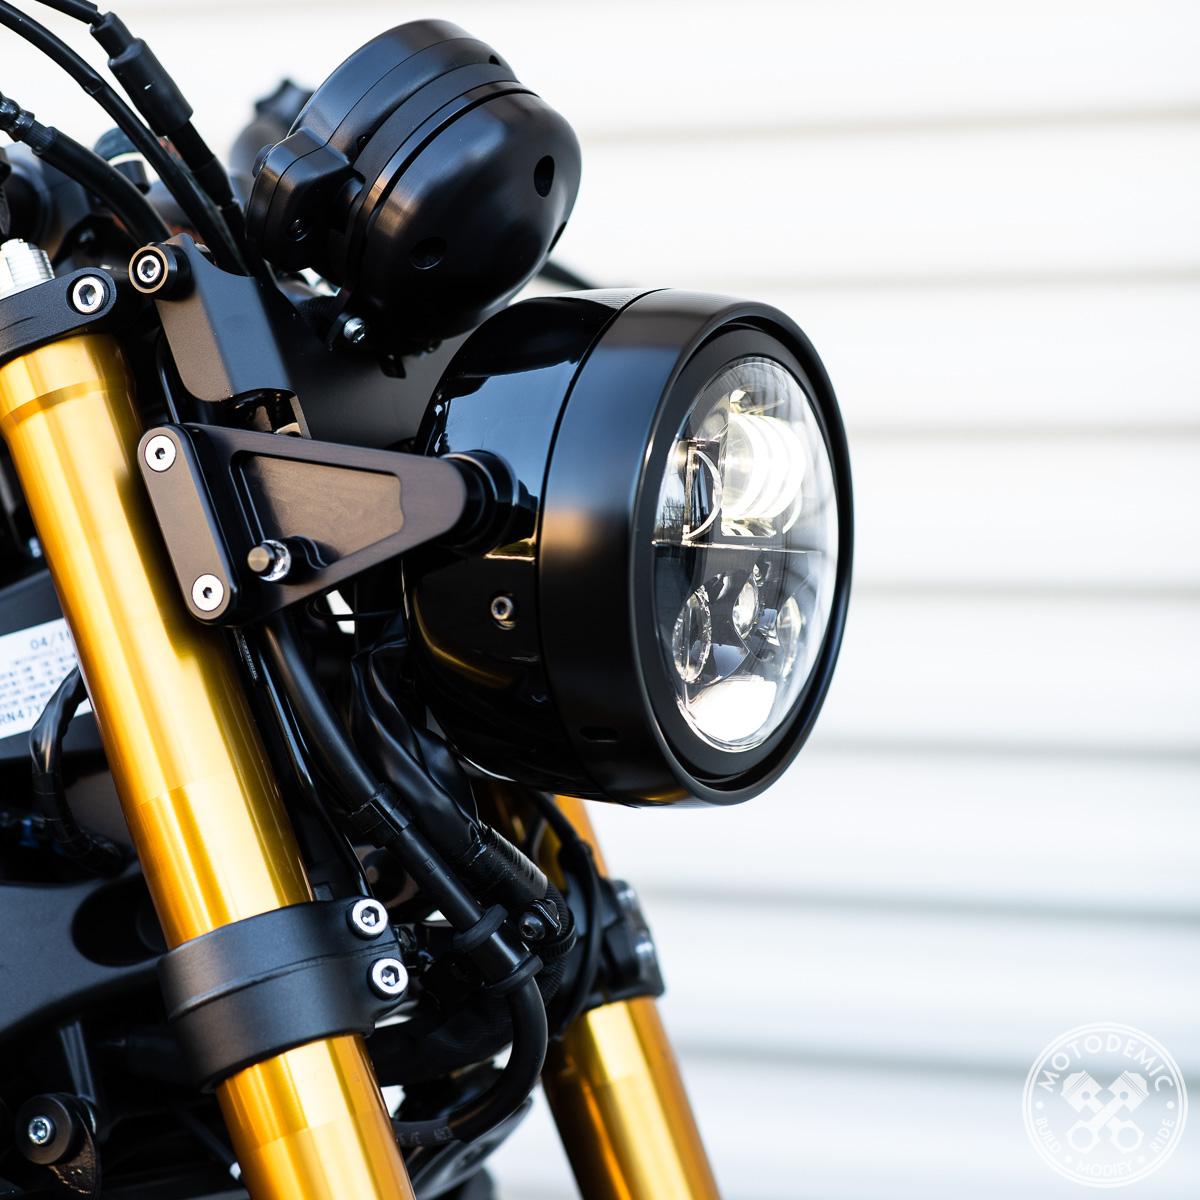 Pair m-Blaze Pin LED Turn Signals Polished Motogadget MG6004010